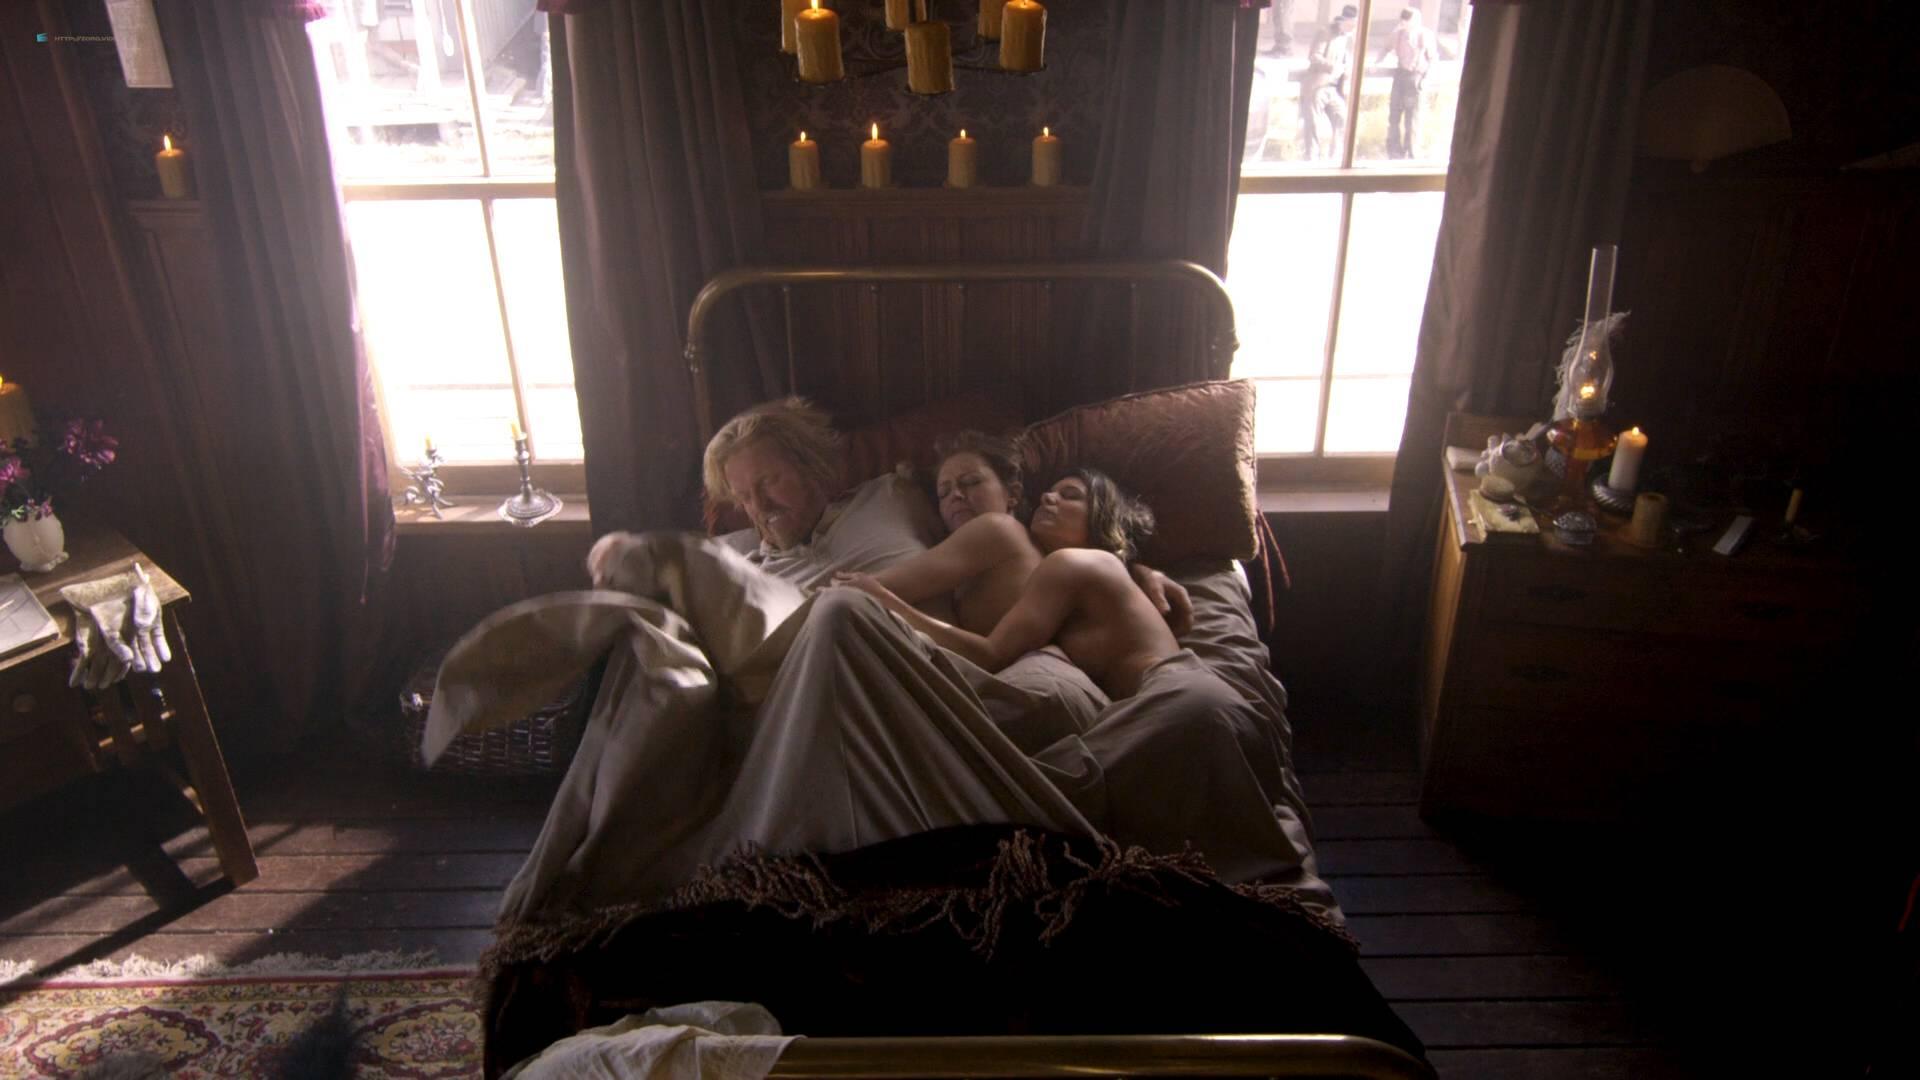 Elizabeth-Lavender-nude-topless-Elysia-Rotaru-nude-butt-boobs-Dead-Again-in-Tombstone-2017-HD-1080p-BluRay-14.jpg